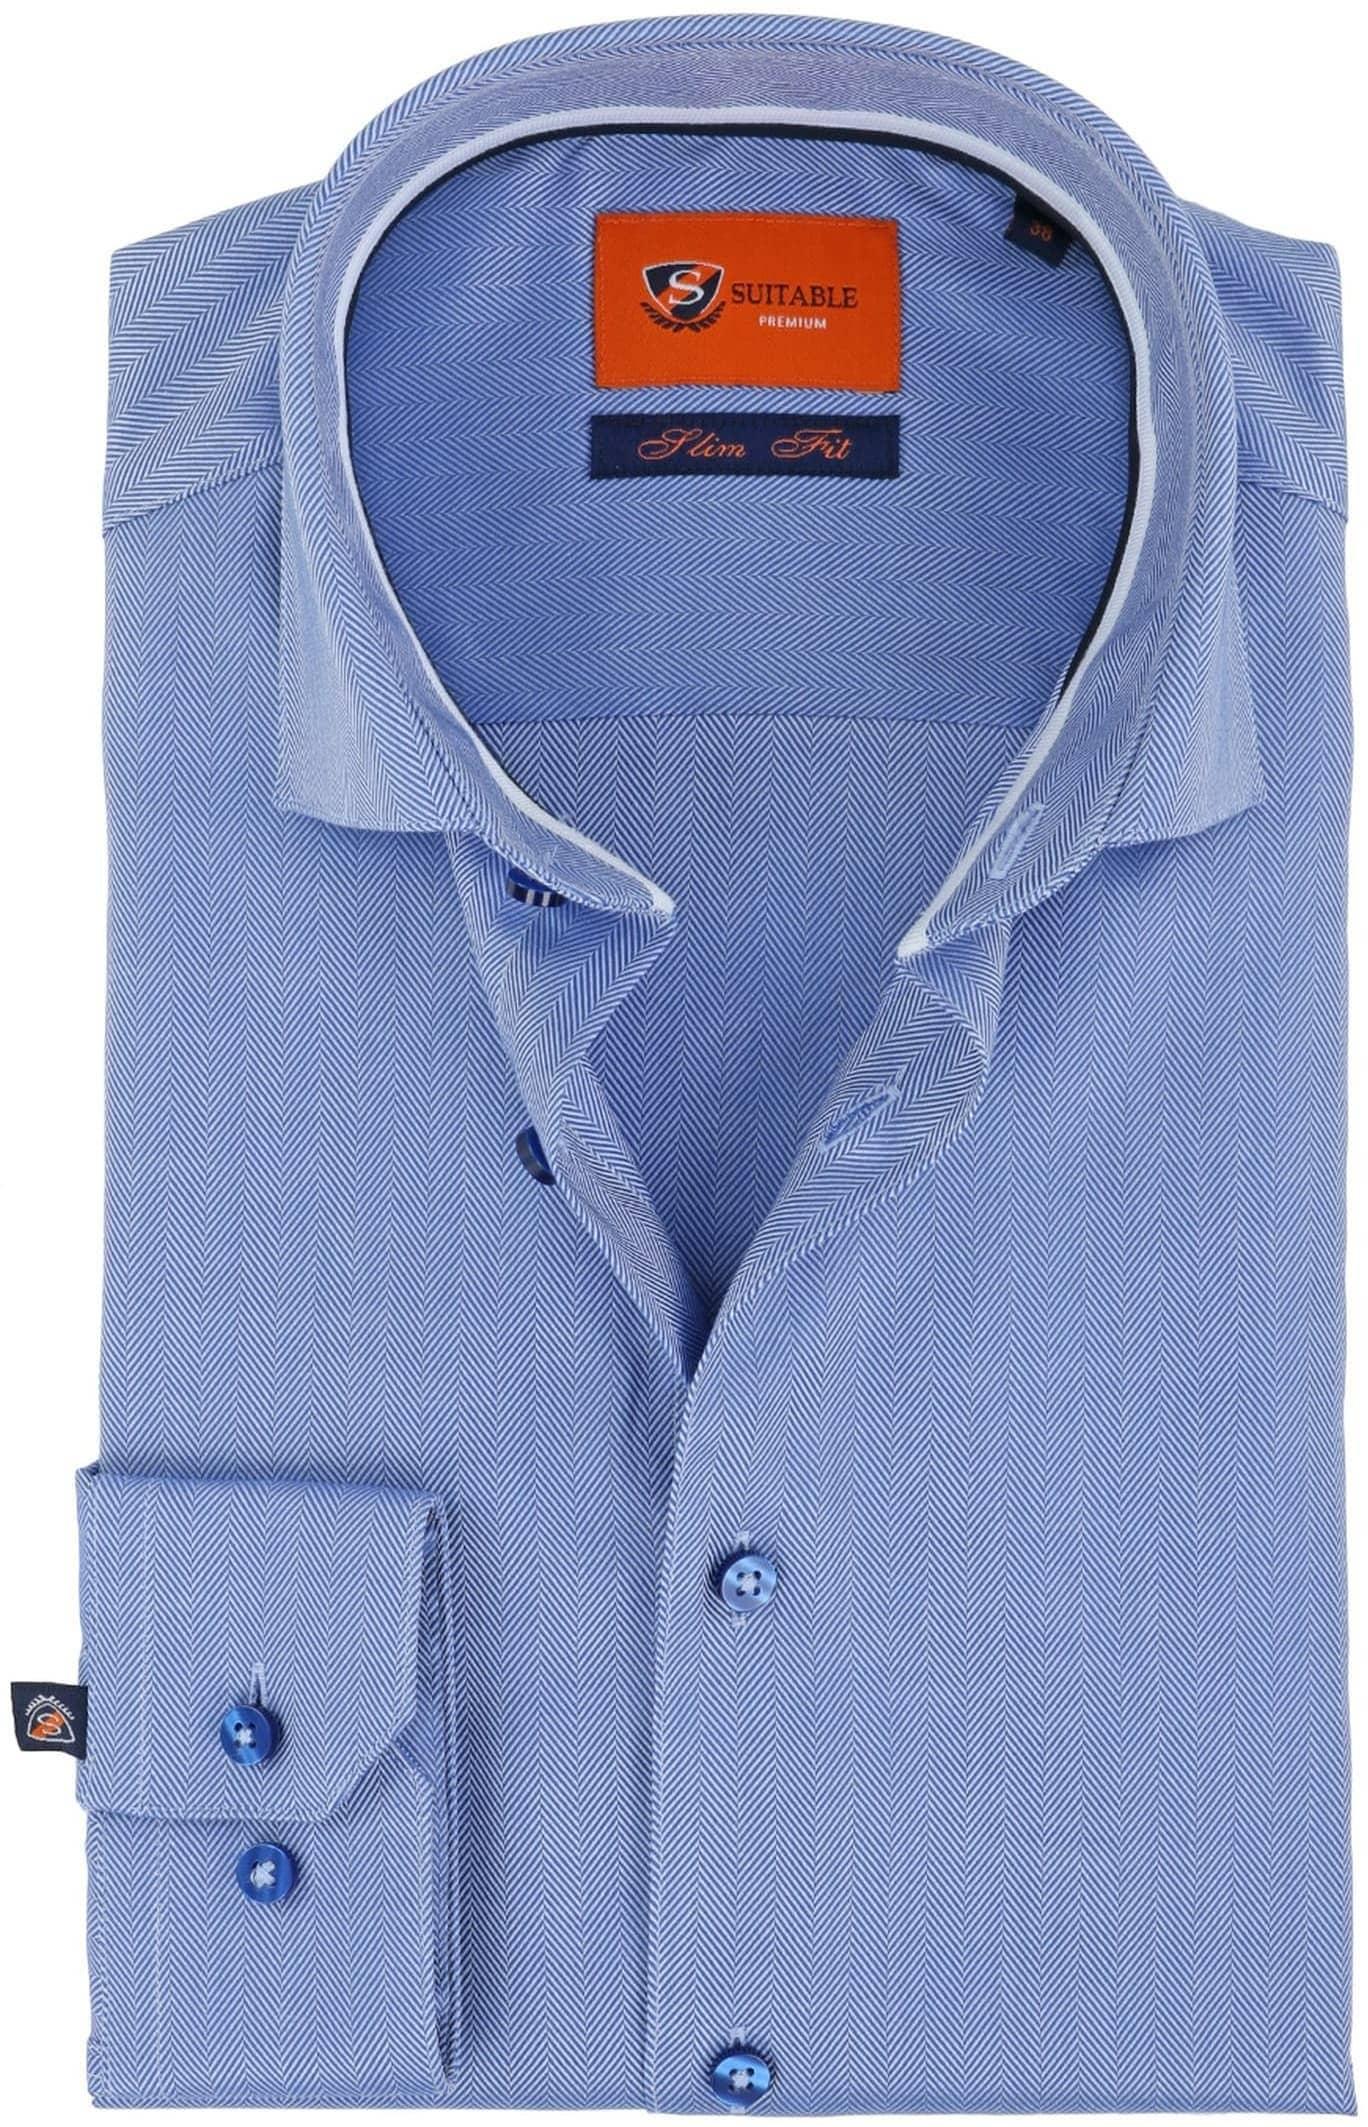 Suitable Overhemd Herringbone Blauw foto 0